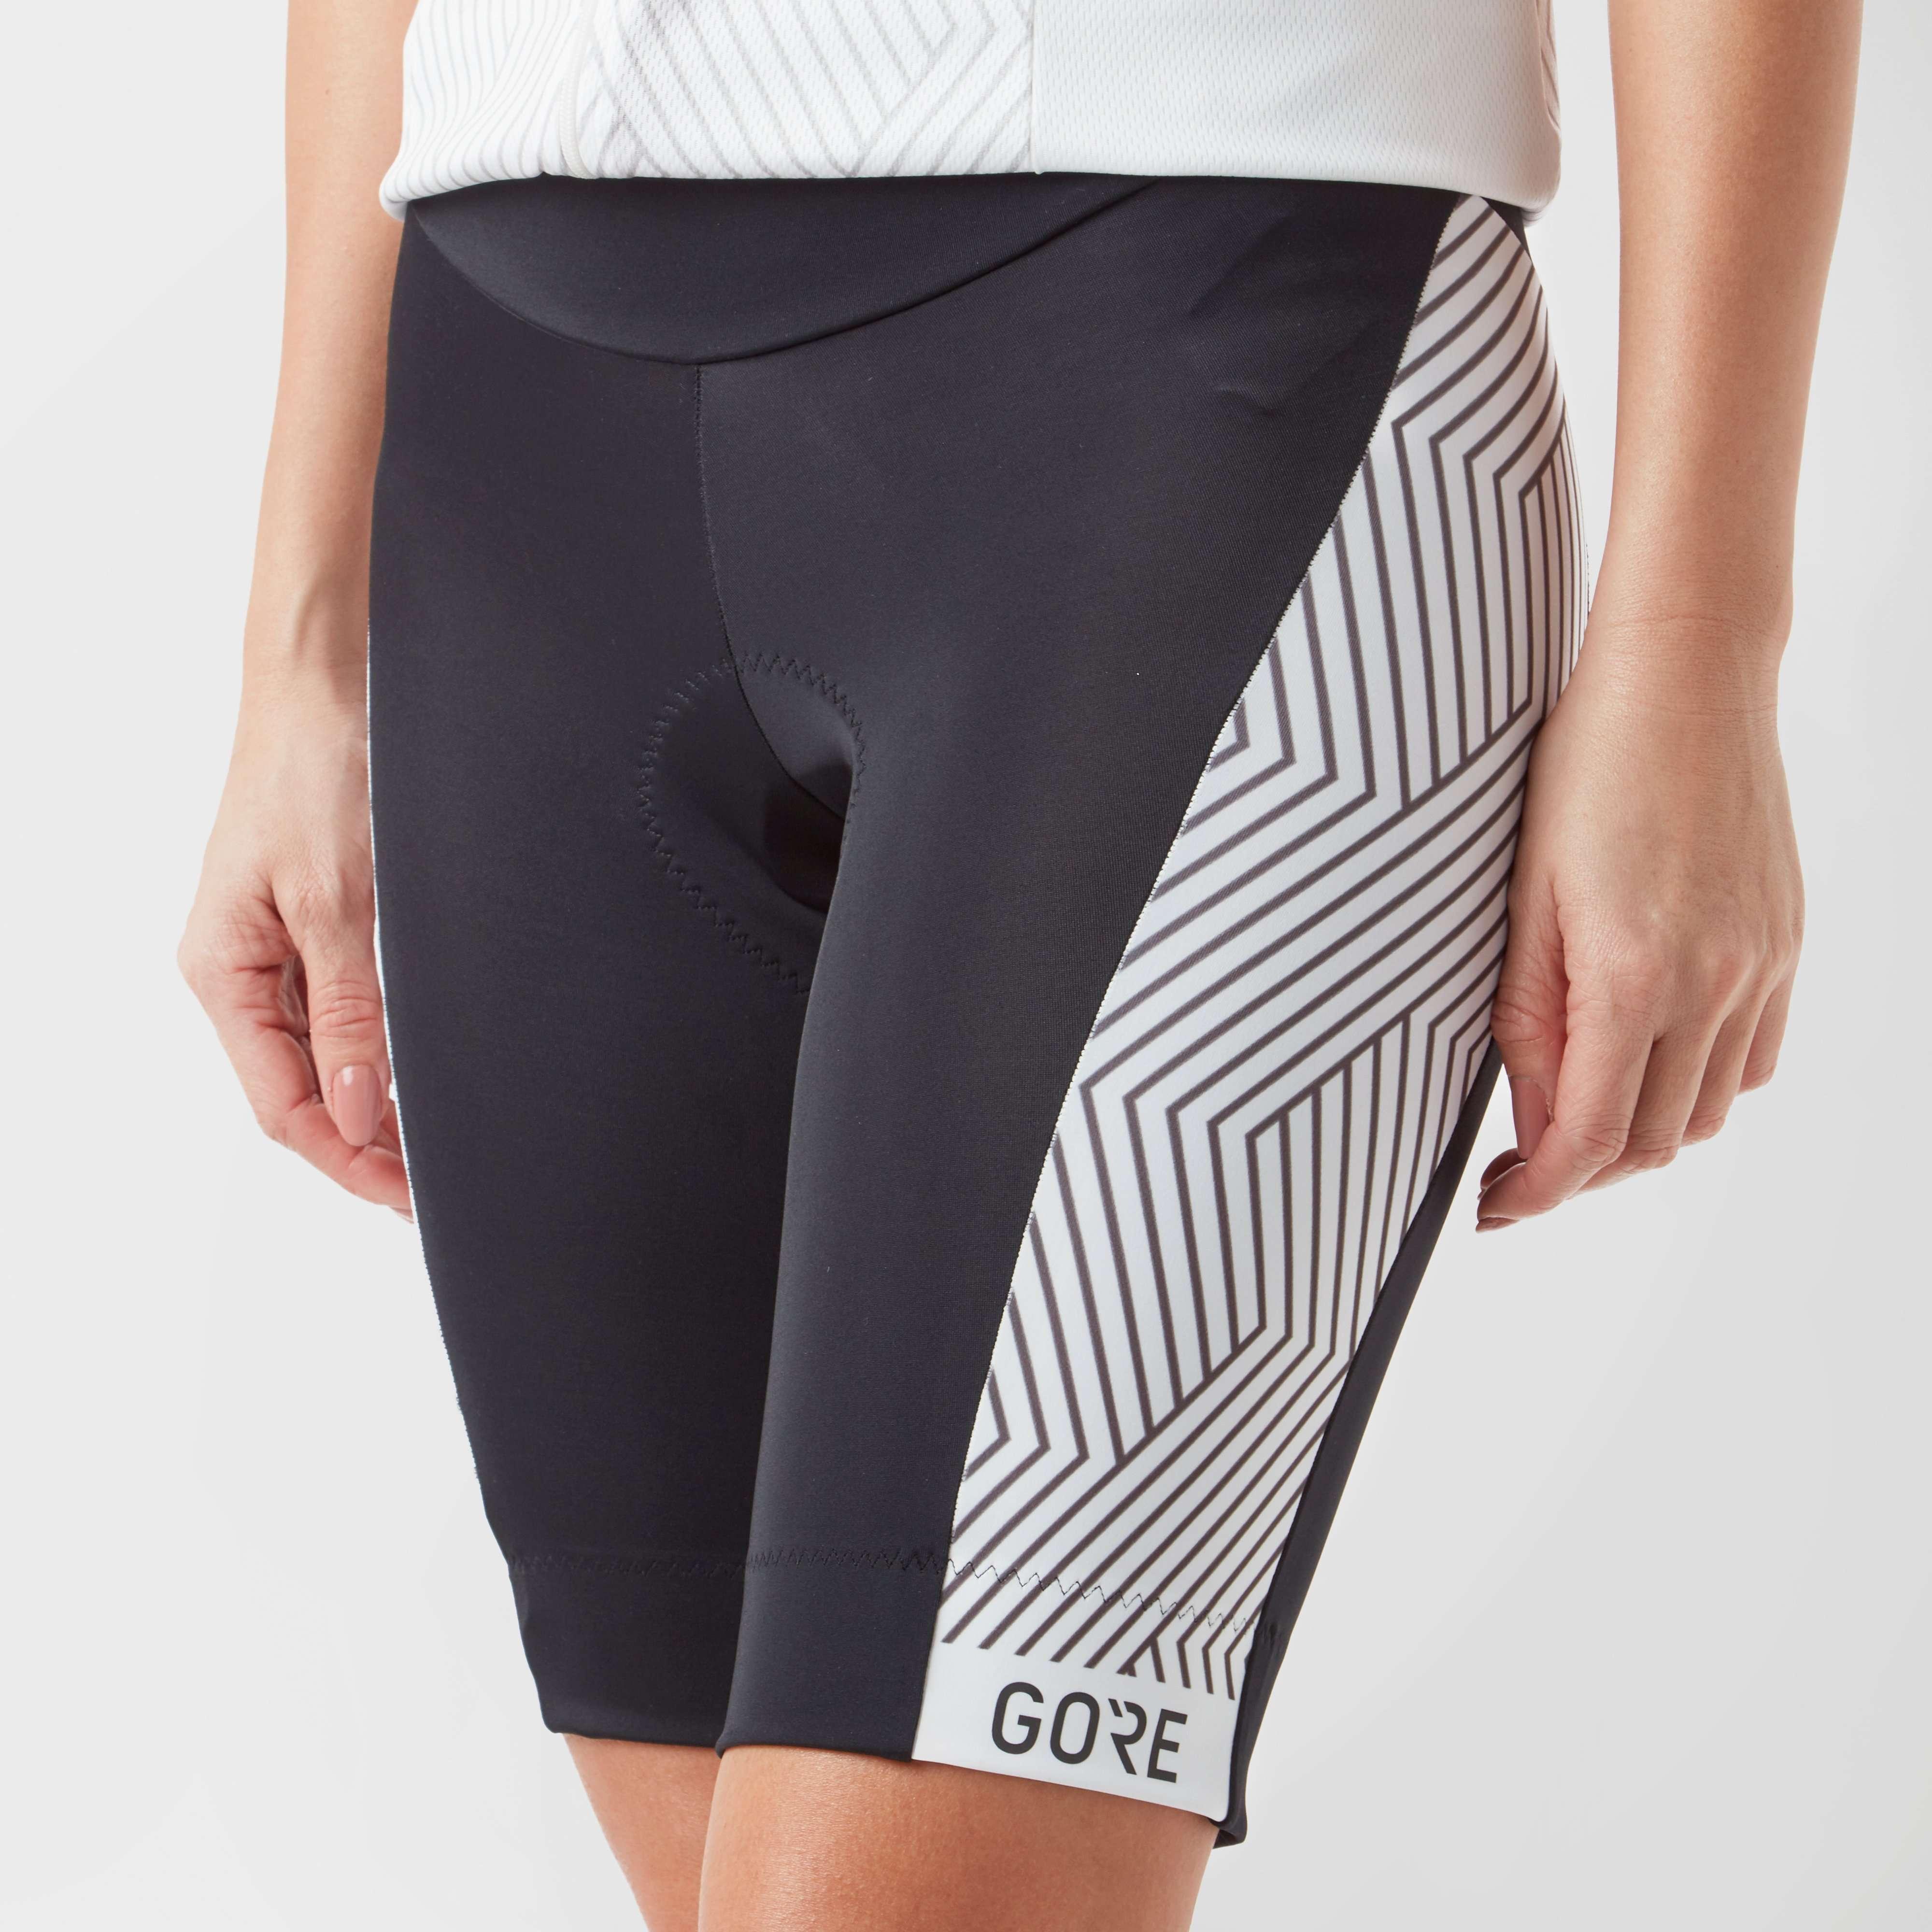 GORE Women's C3 Optiline Short Tights+